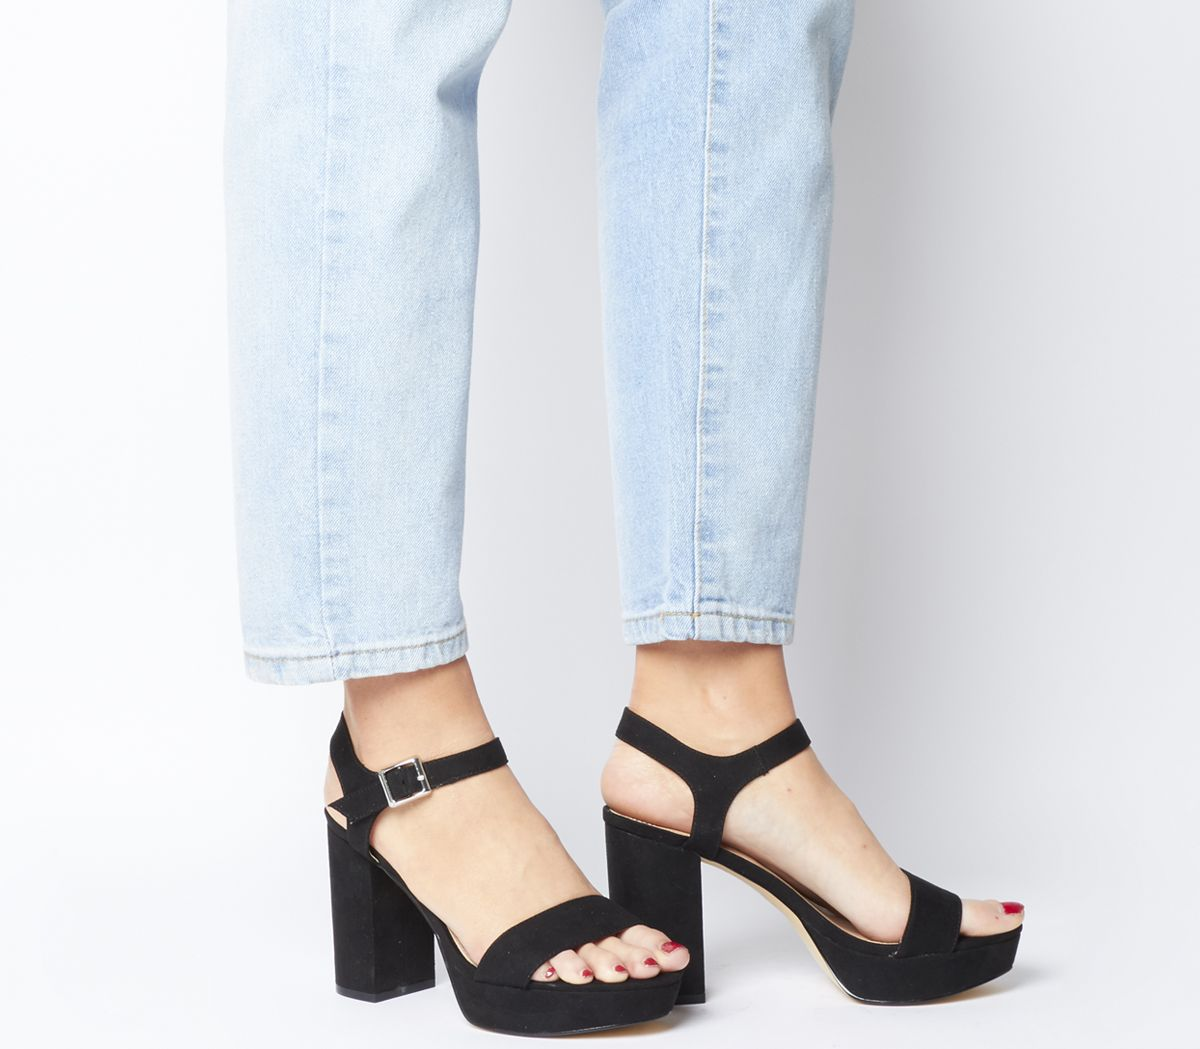 5f02c5a787 Office Must Have Platform Sandals Black - Mid Heels